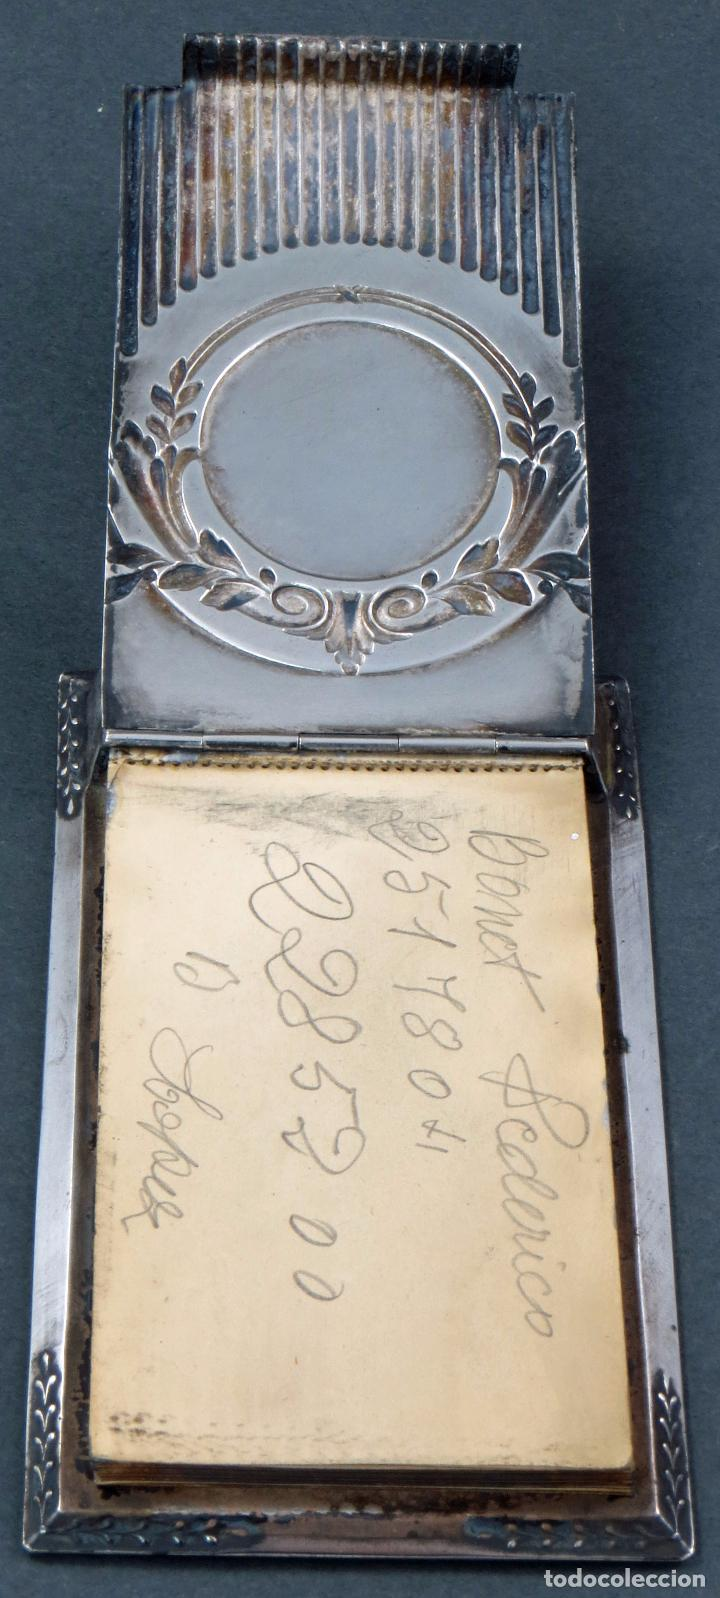 Antigüedades: Agenda modernista de plata con libreta principios del siglo XX - Foto 3 - 105970775